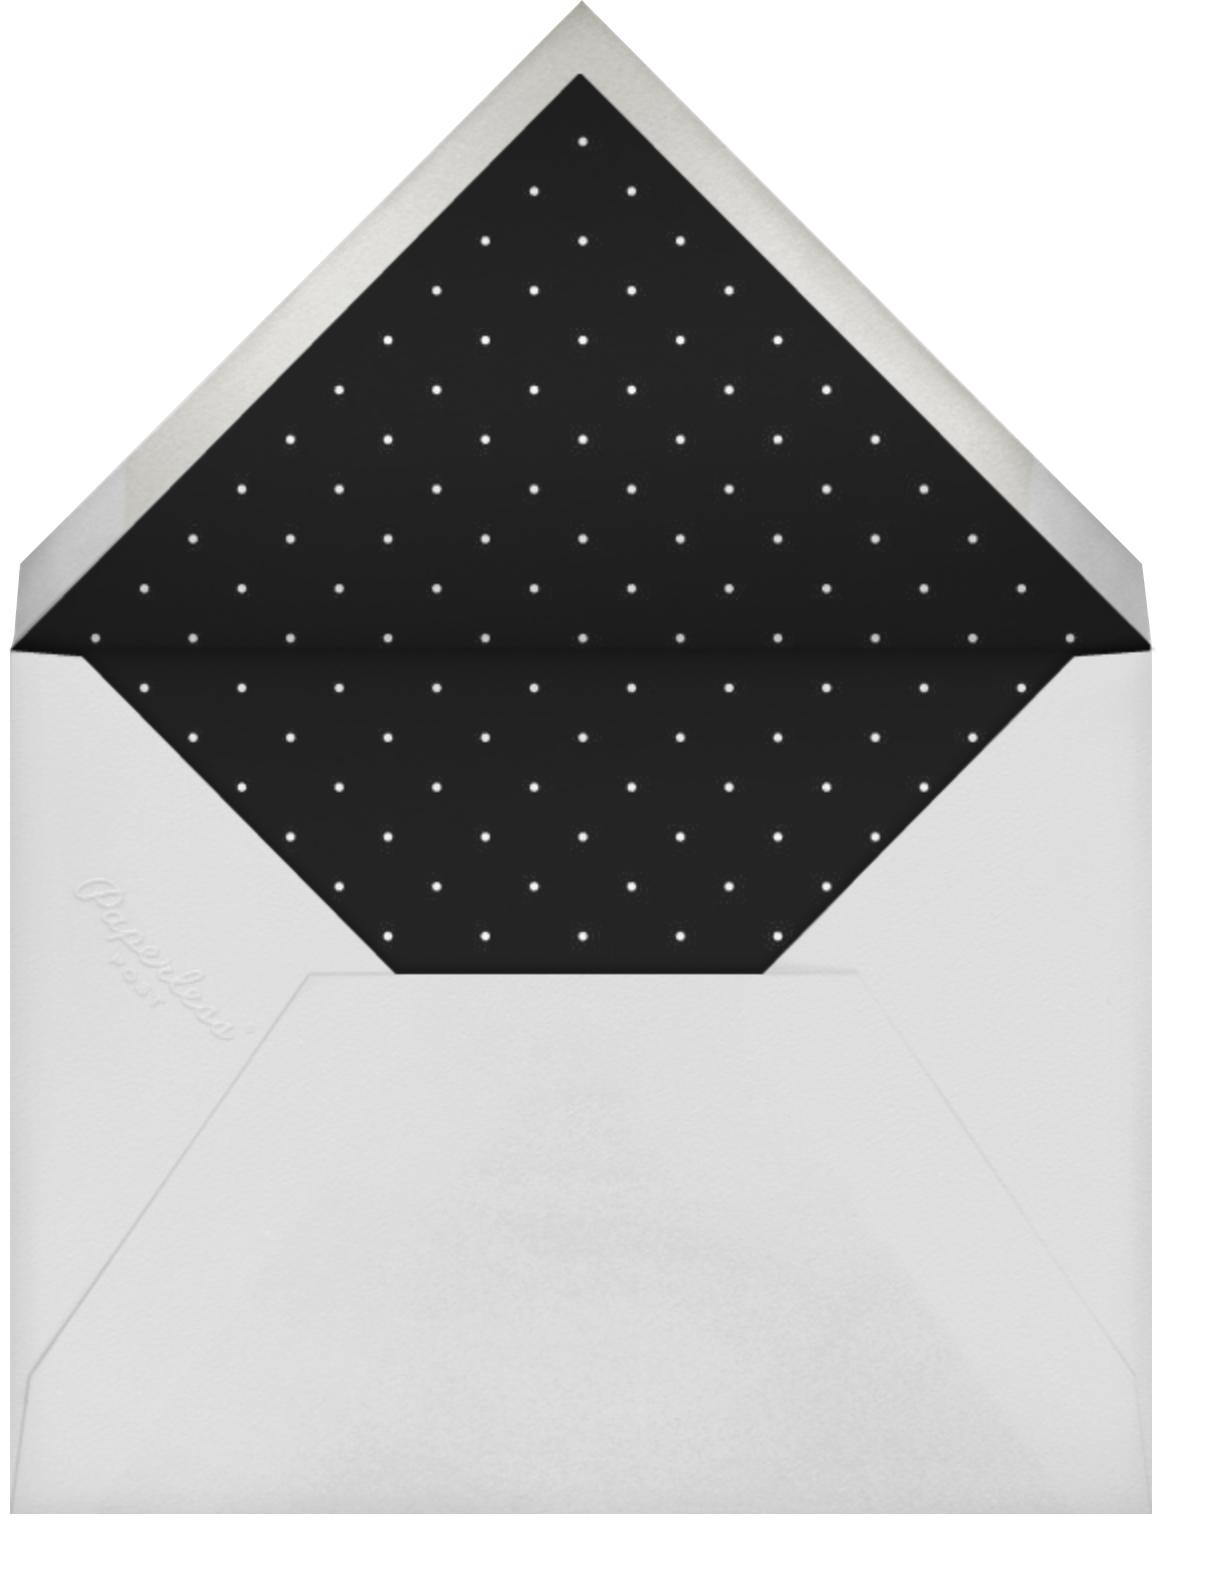 Las Vegas Skyline View (Invitation) - White/Gold - Paperless Post - All - envelope back